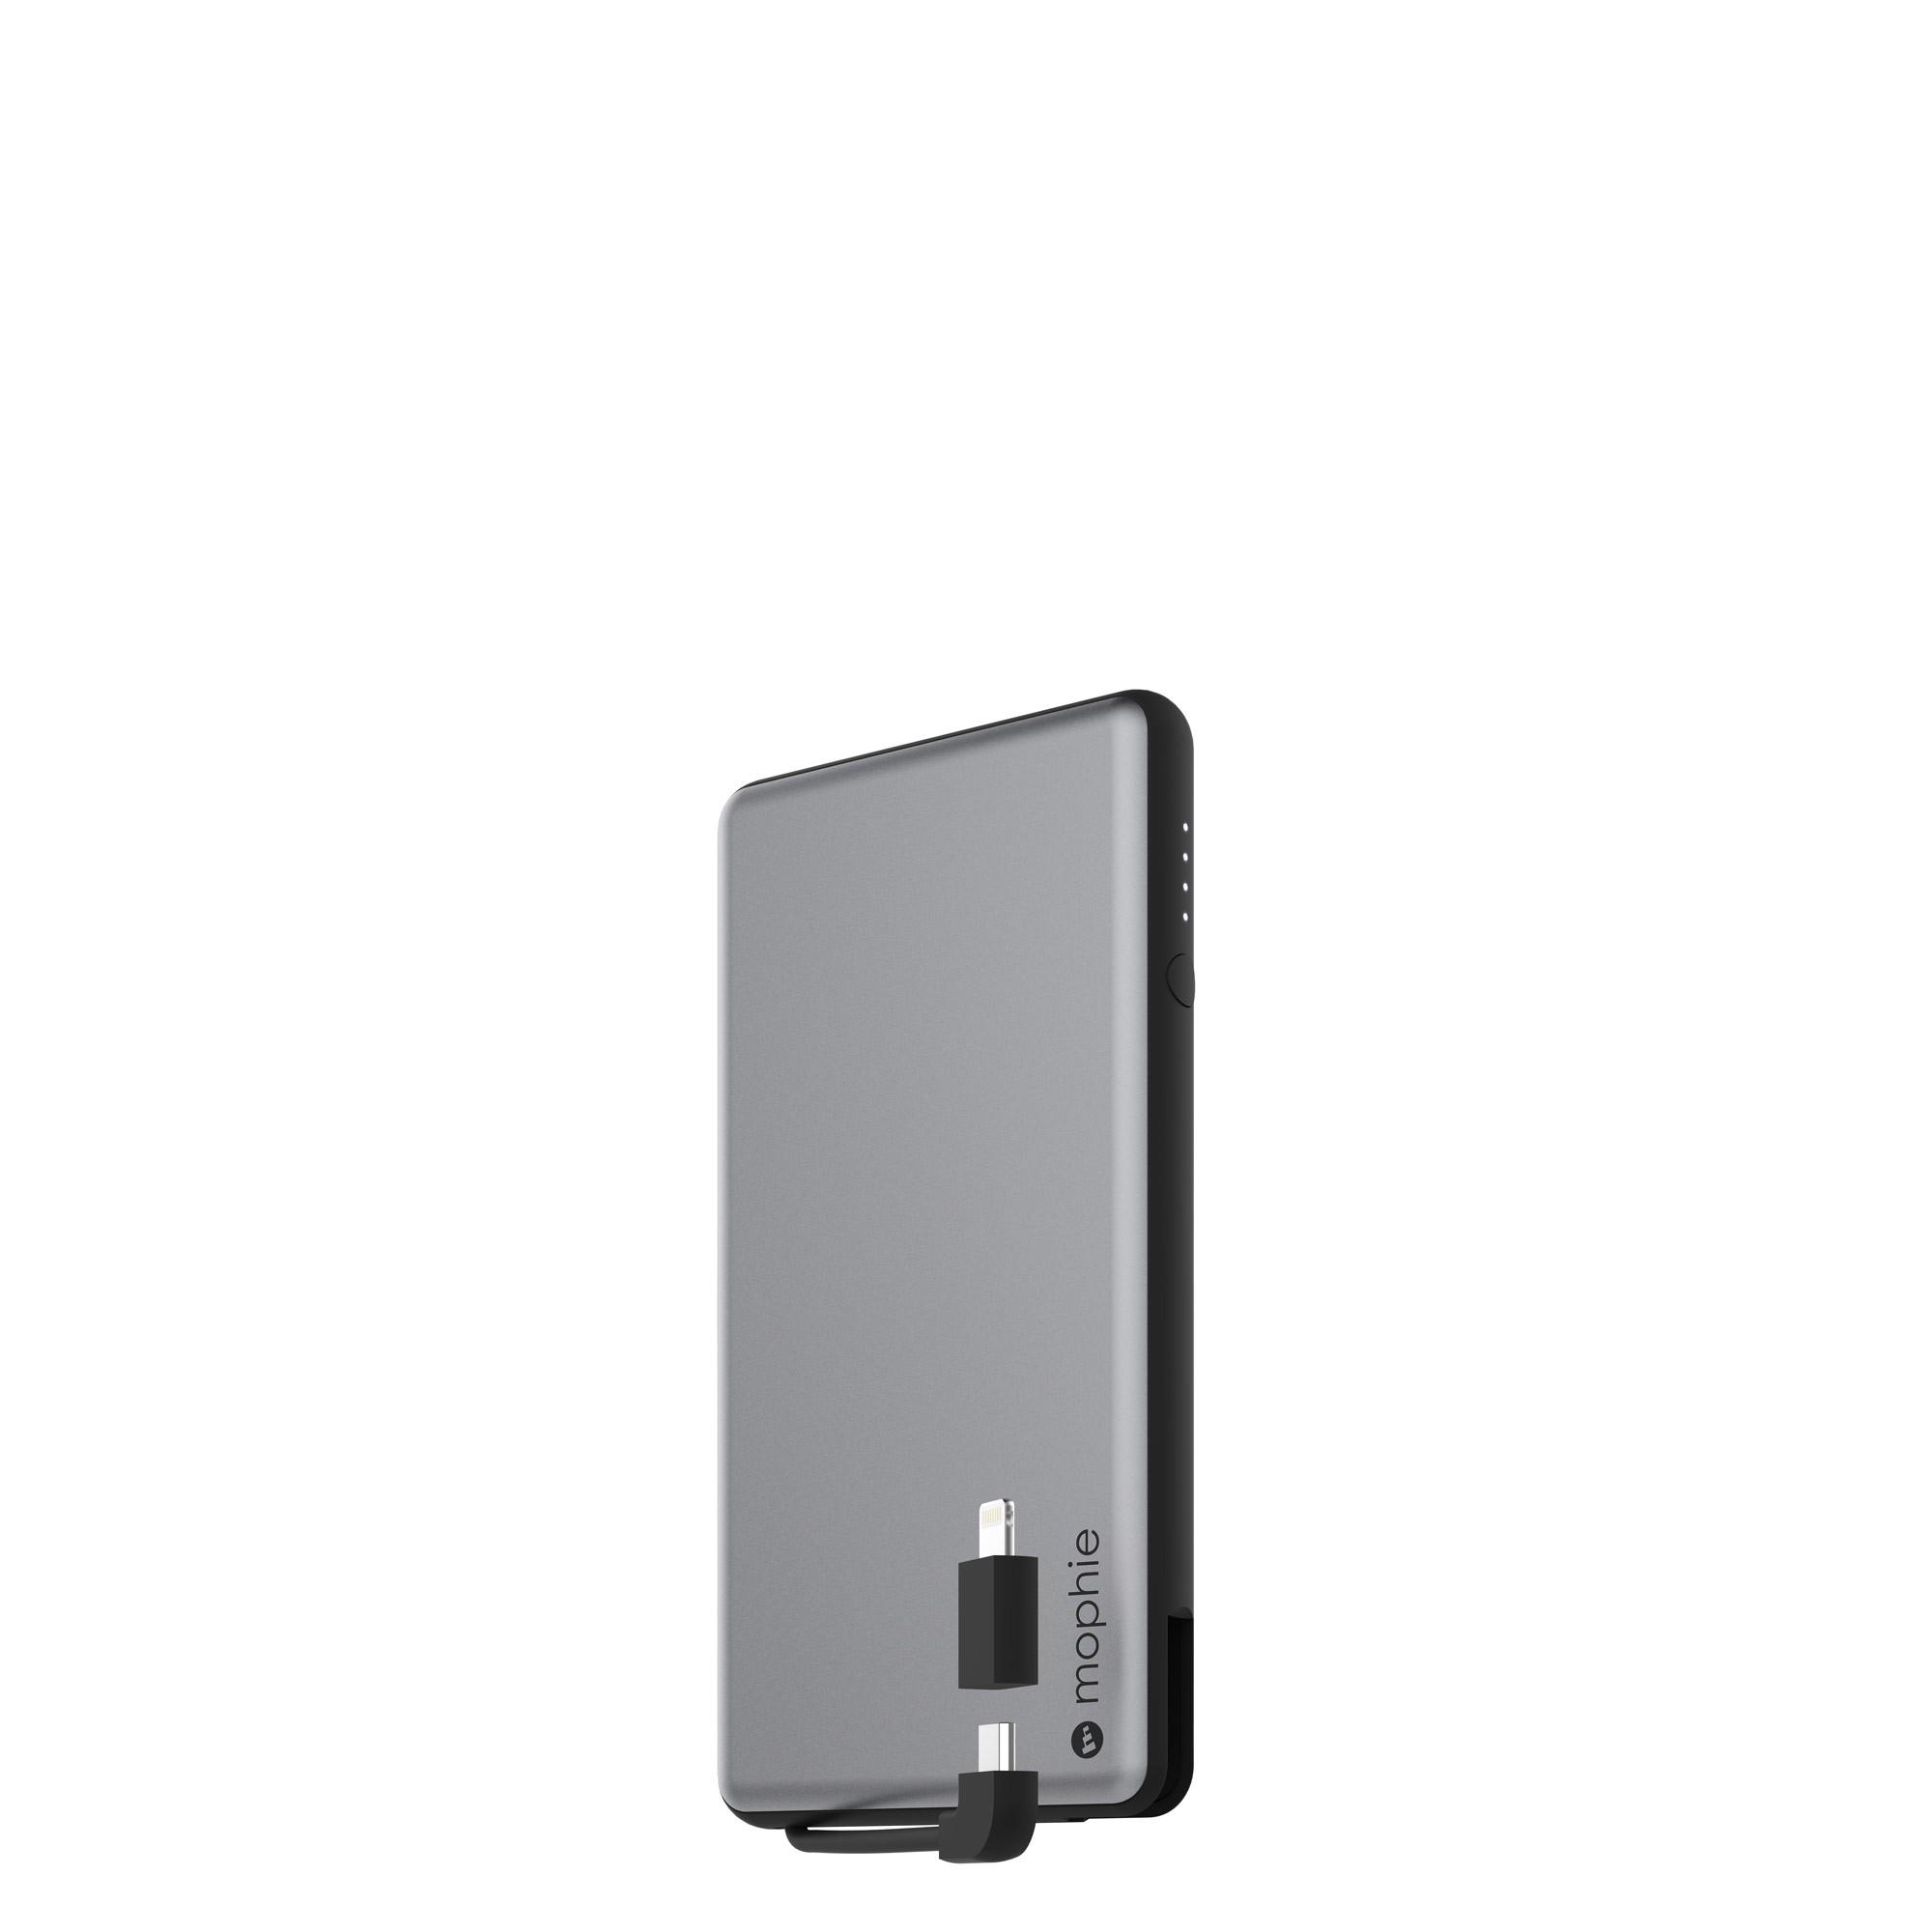 Mophie Powerstation Plus 6000 mAh Space Gray/Black